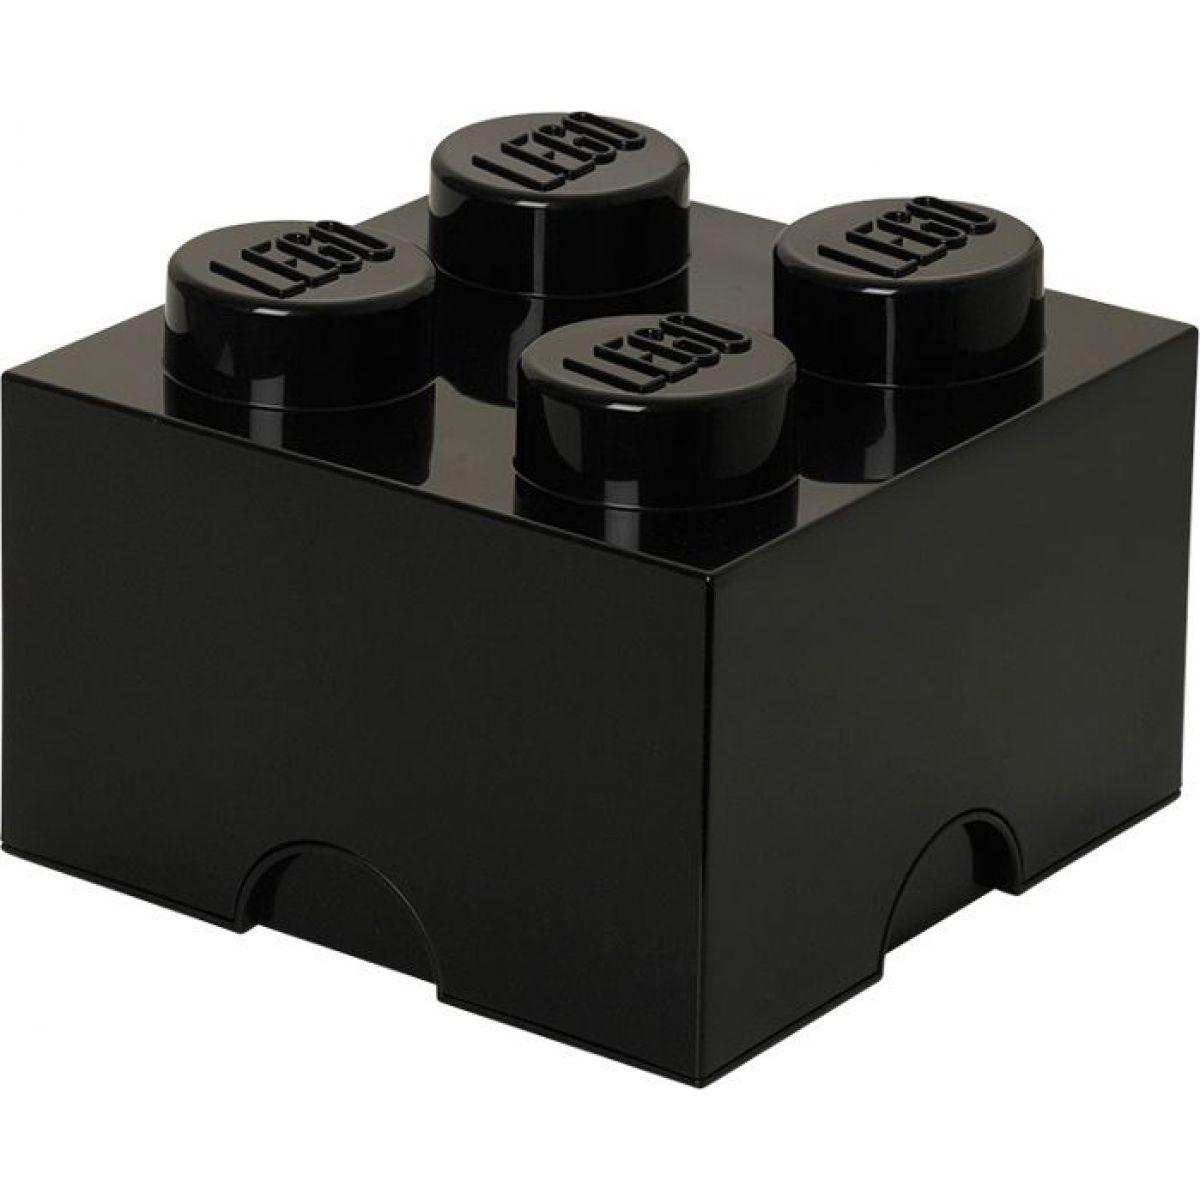 LEGO Úložný box 25 x 25 x 18 cm Černá